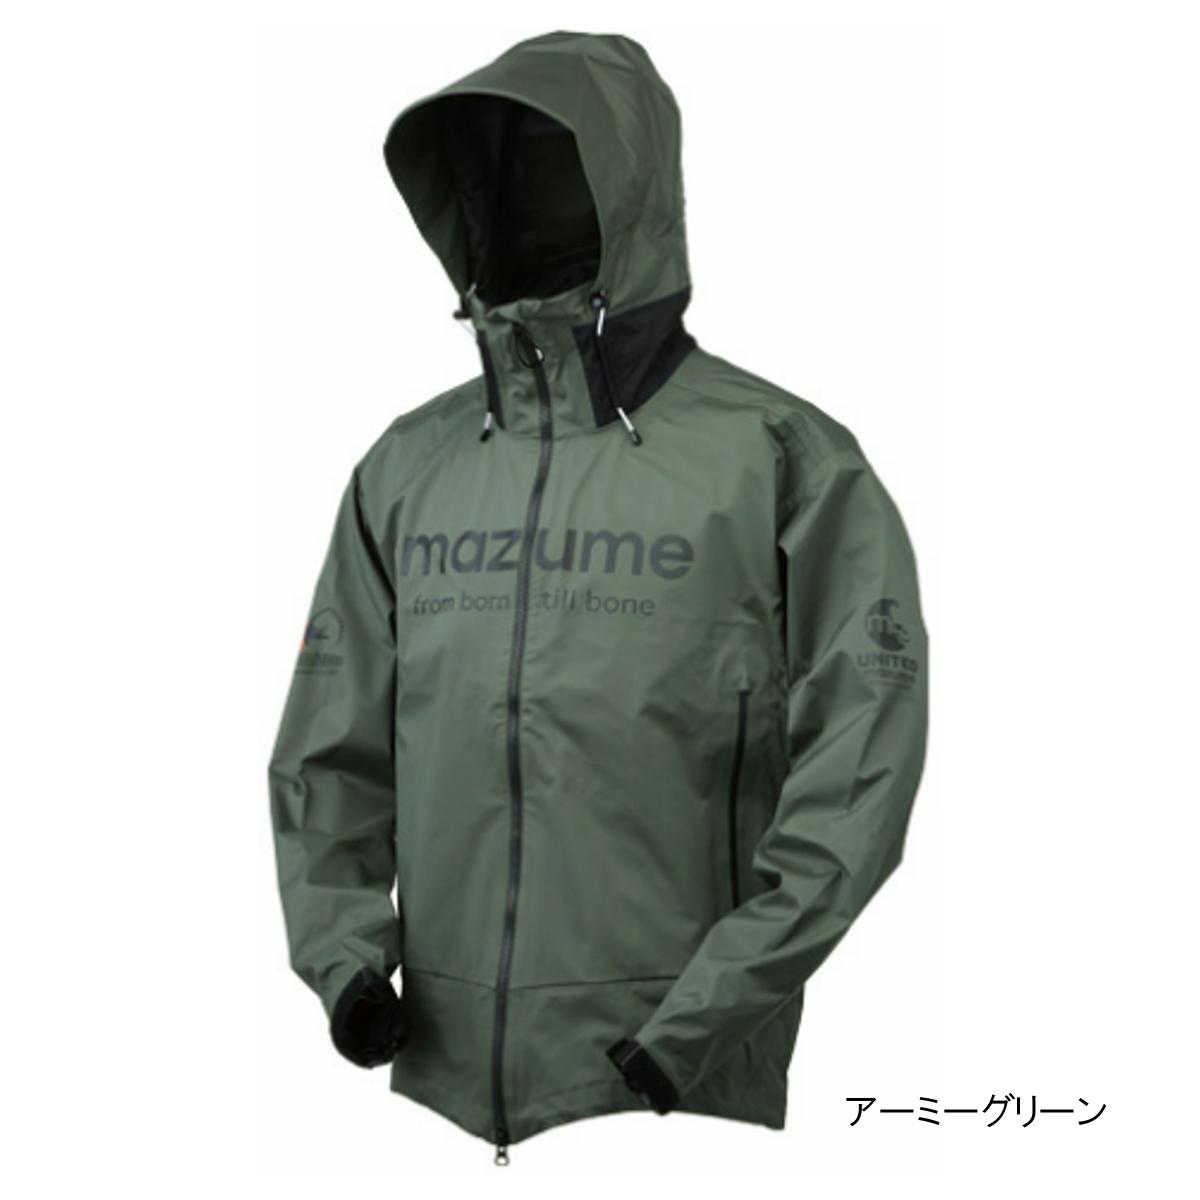 mazume レッドムーンレインジャケット Ver.2 MZRJ-357 M アーミーグリーン